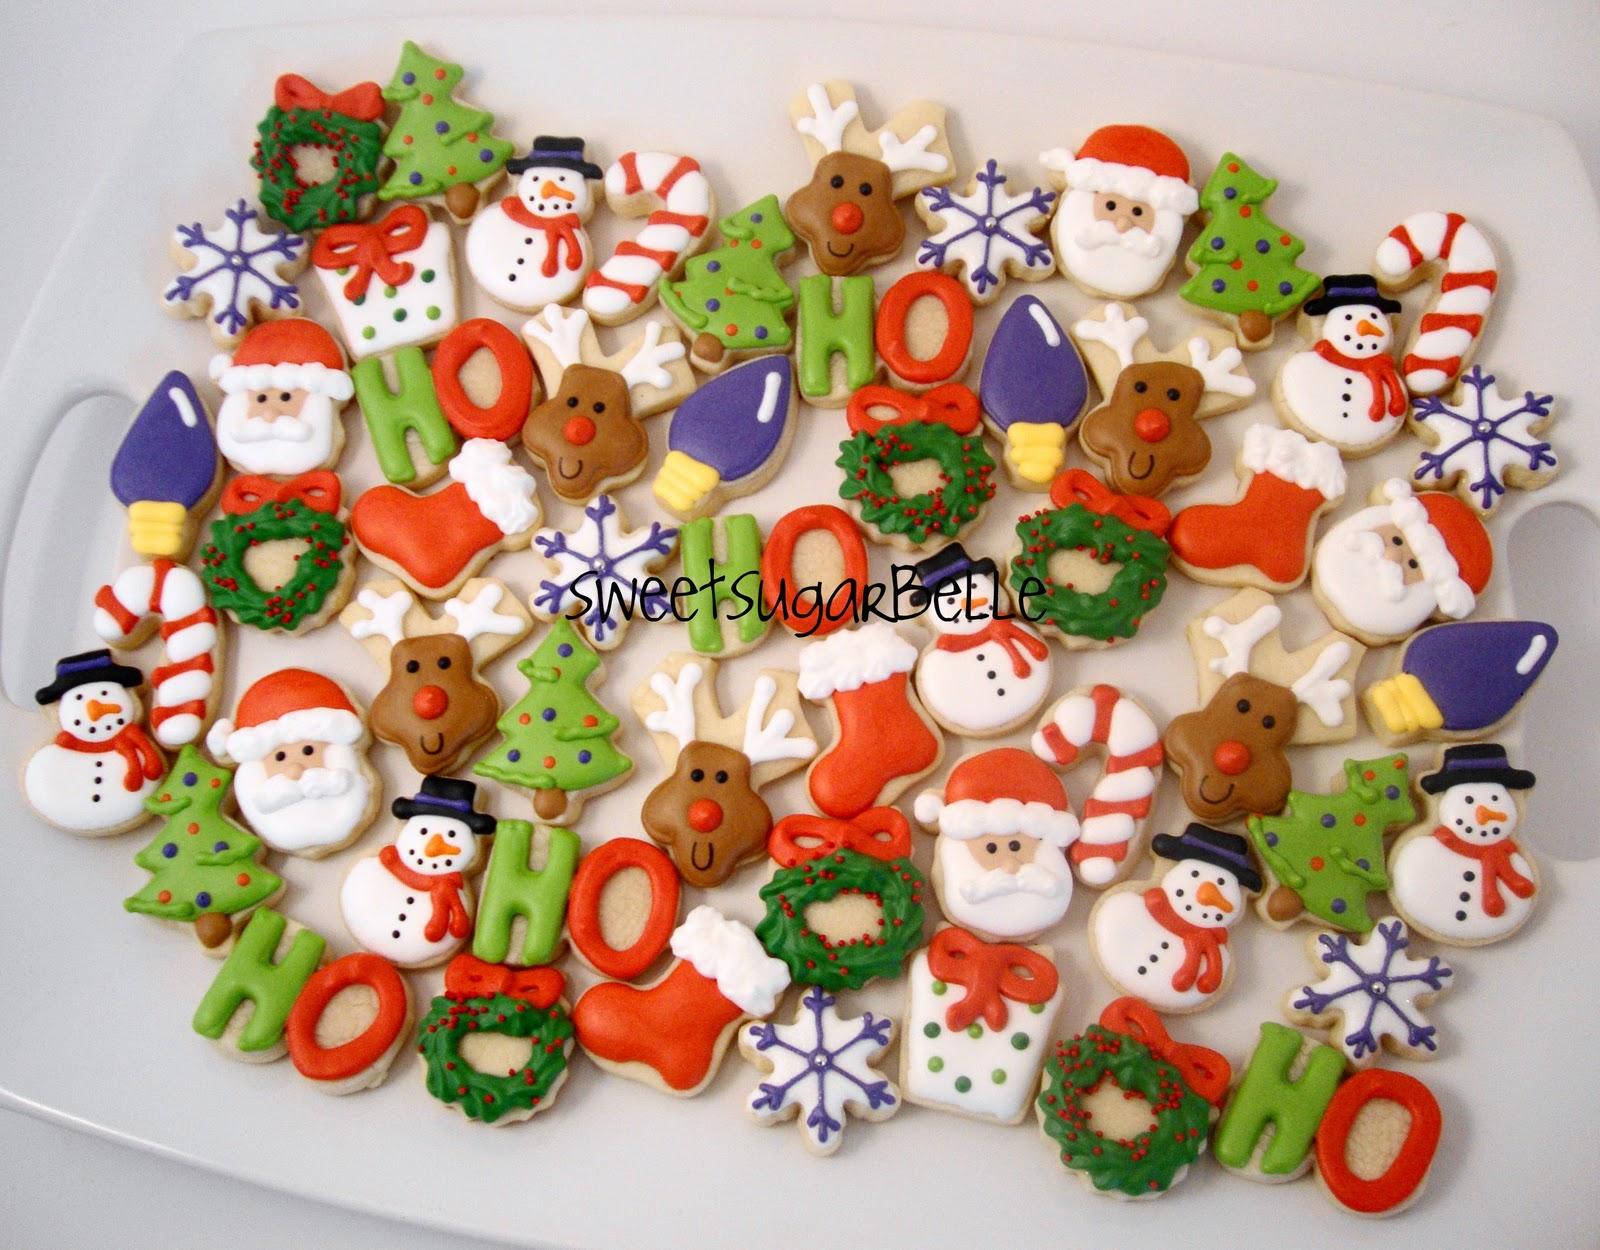 Merry Christmas! – The Sweet Adventures of Sugar Belle